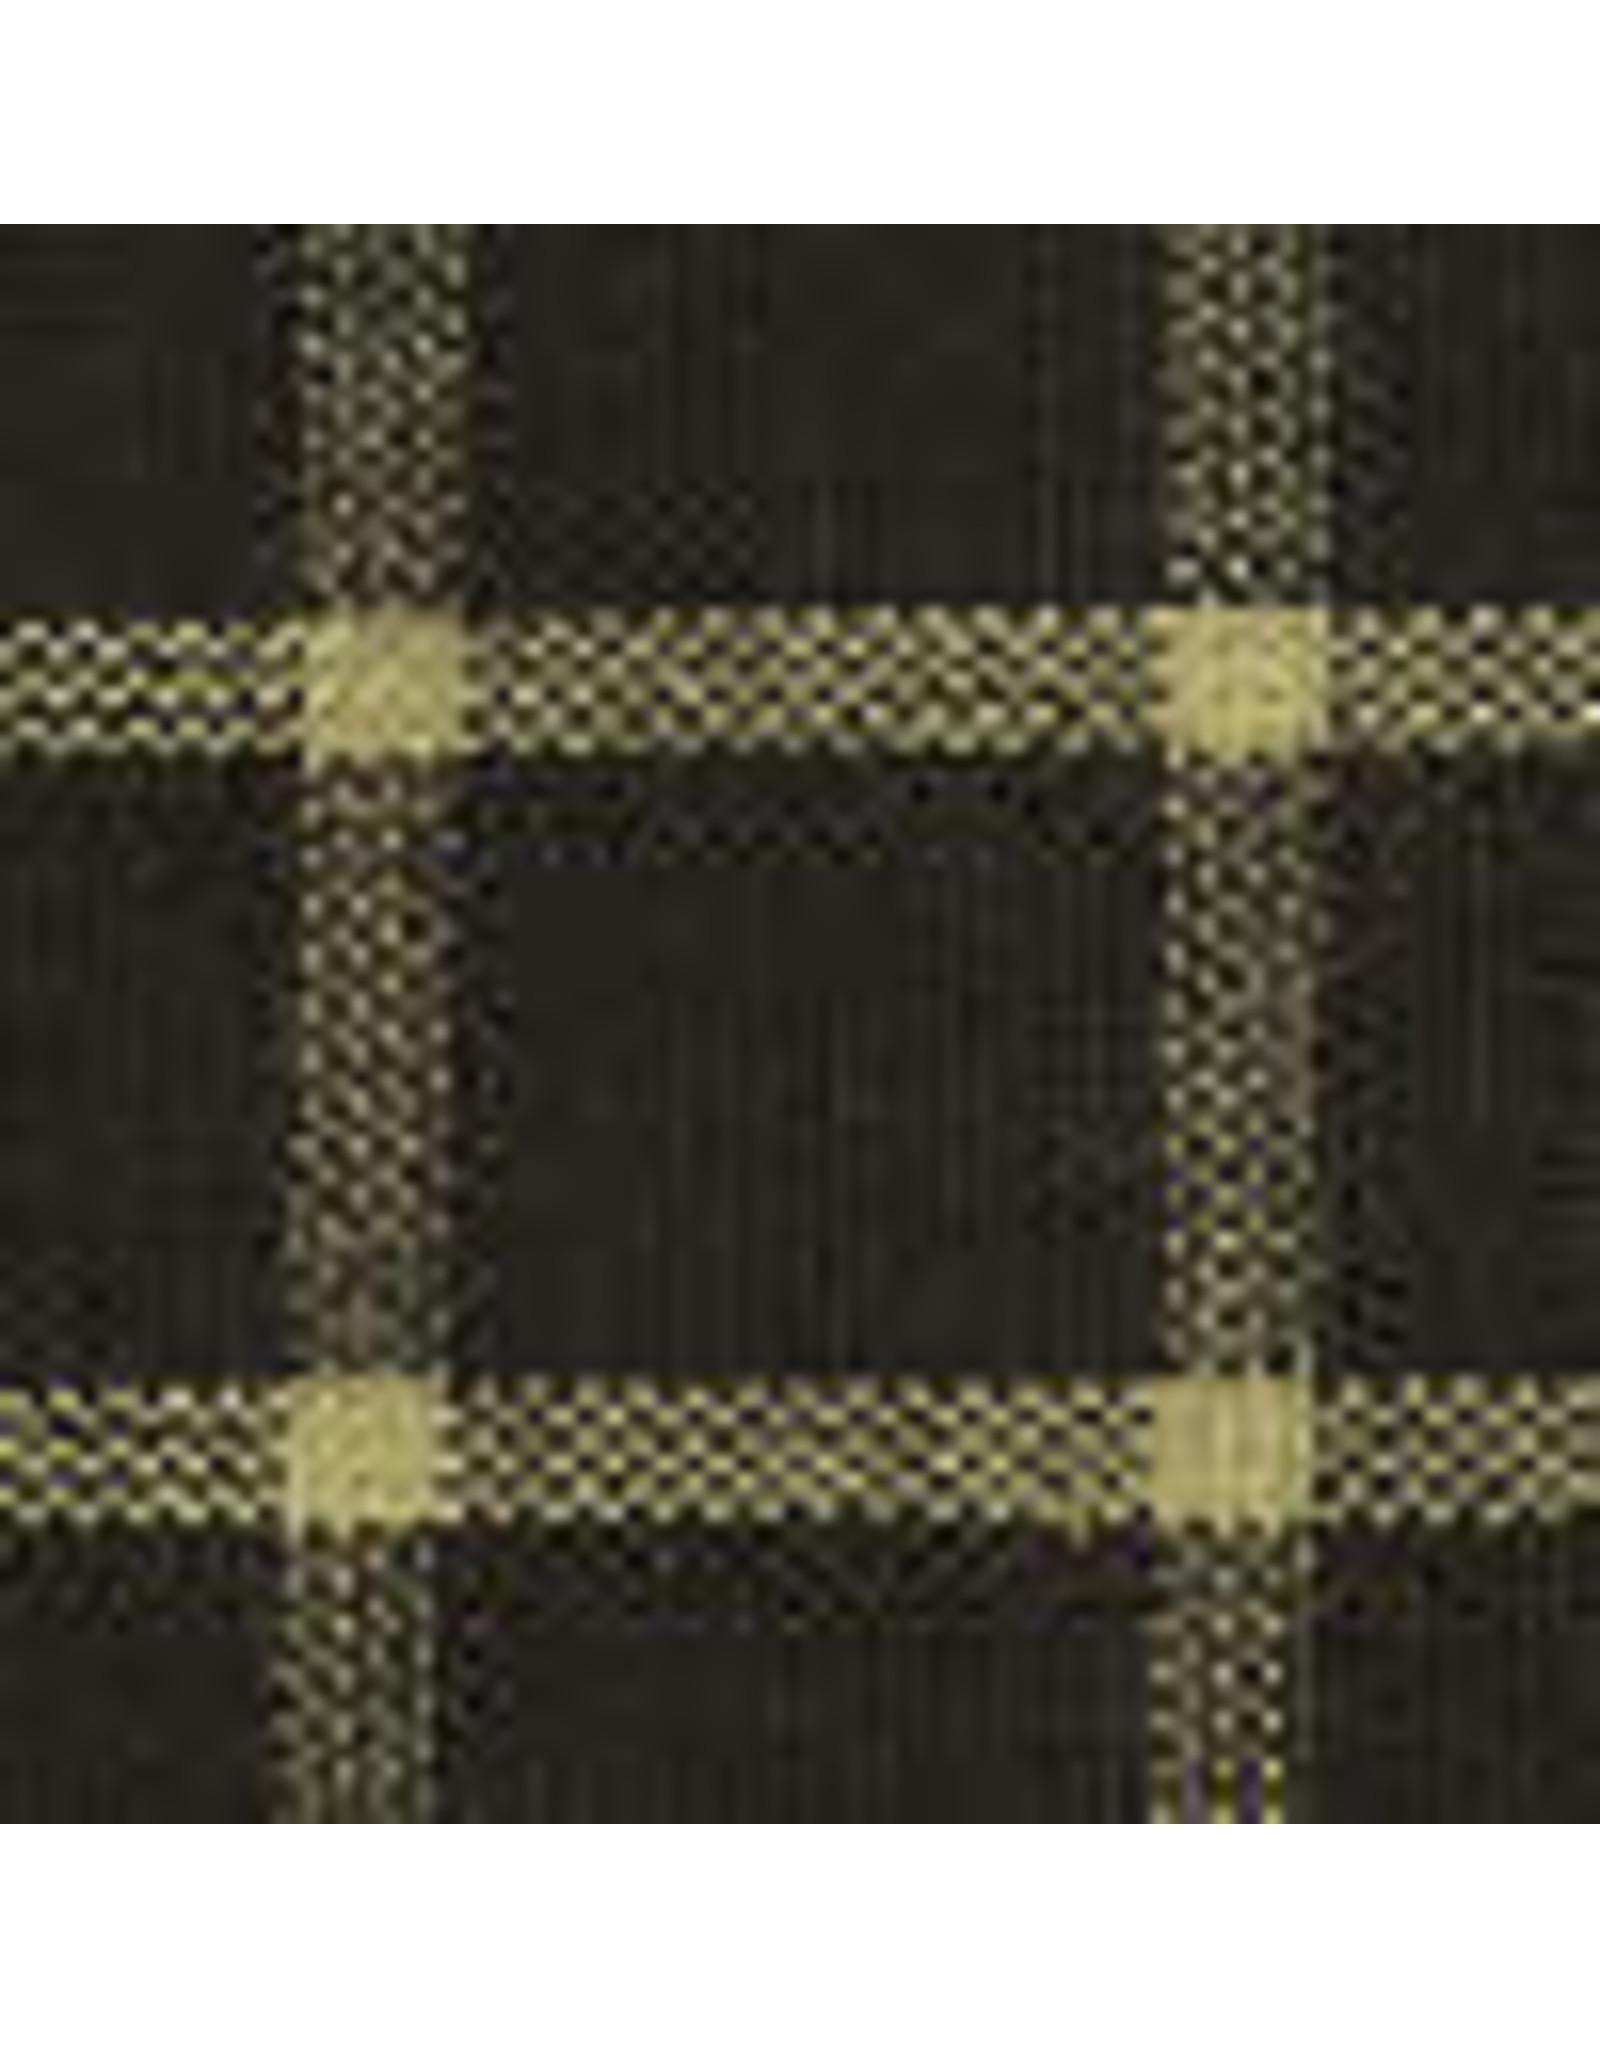 Yd. Navy and Tan Reverse Window Pane Fabric #201